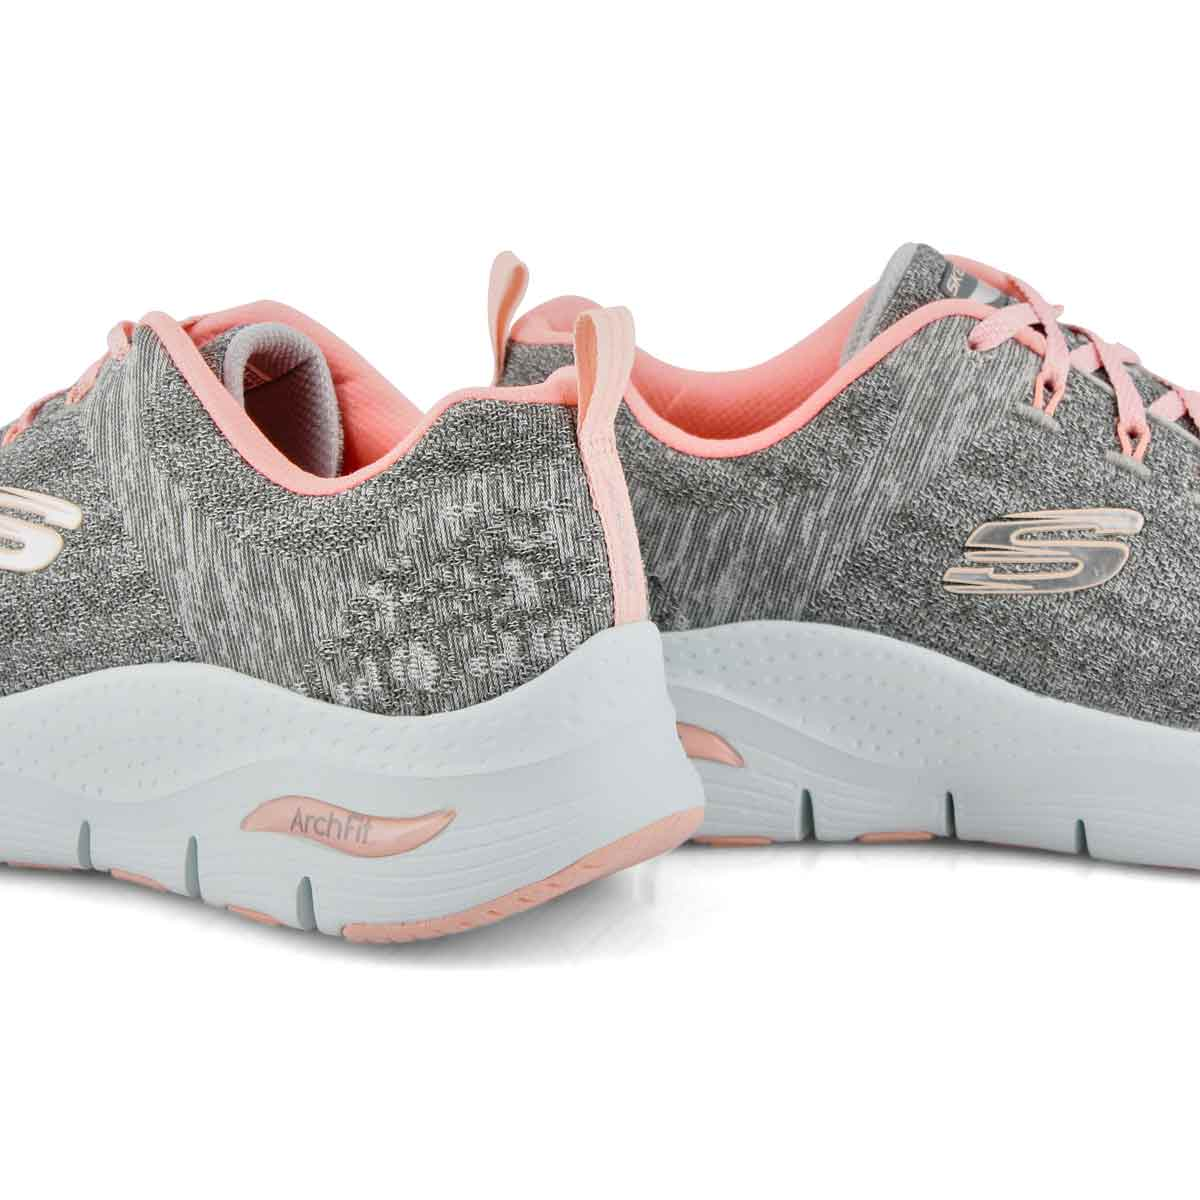 Espadrille ARCH FIT COMFY WAVE gris/rose femmes